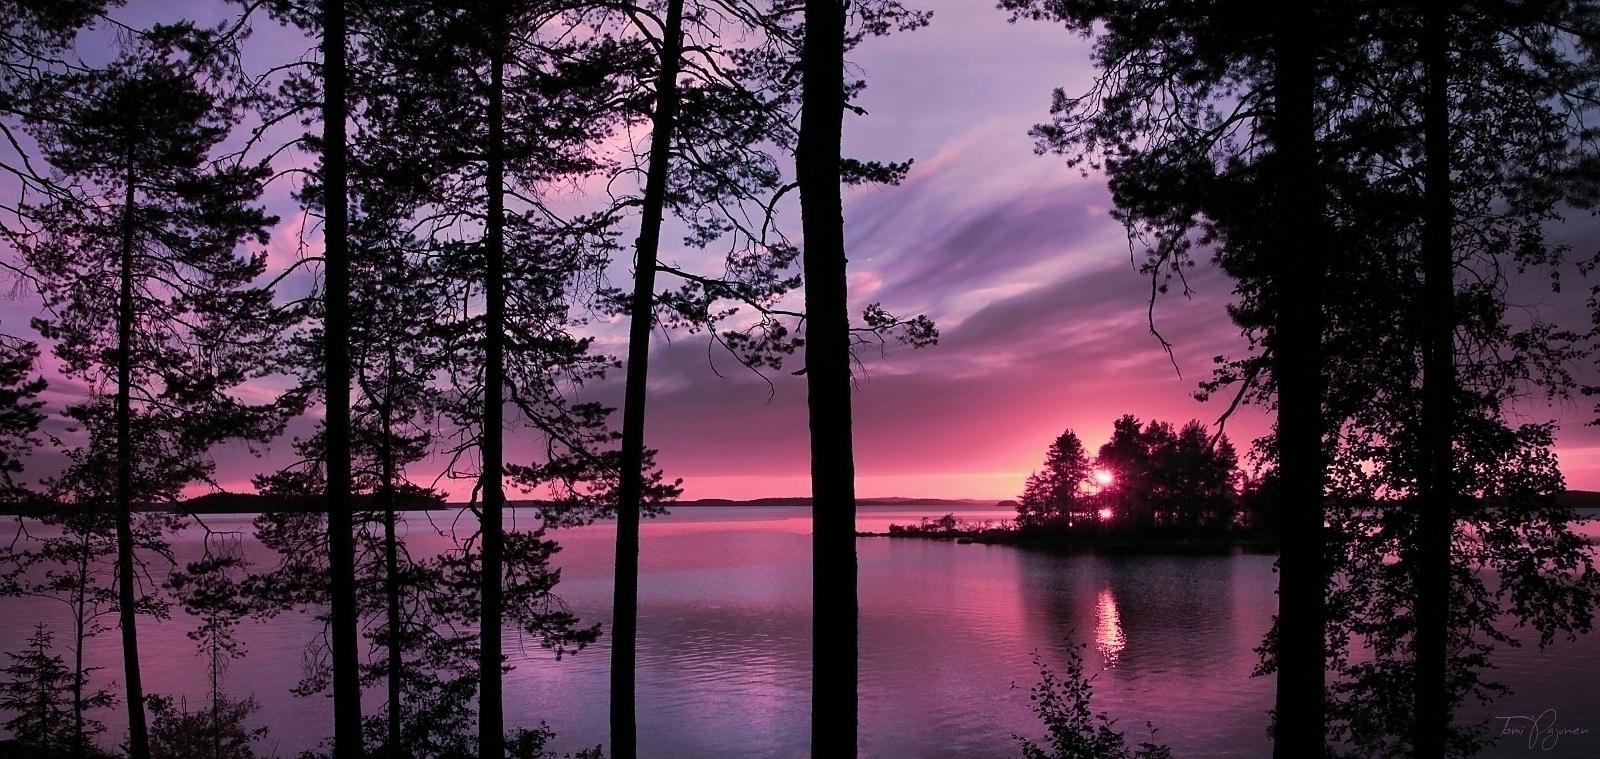 Trees' silhouettes II